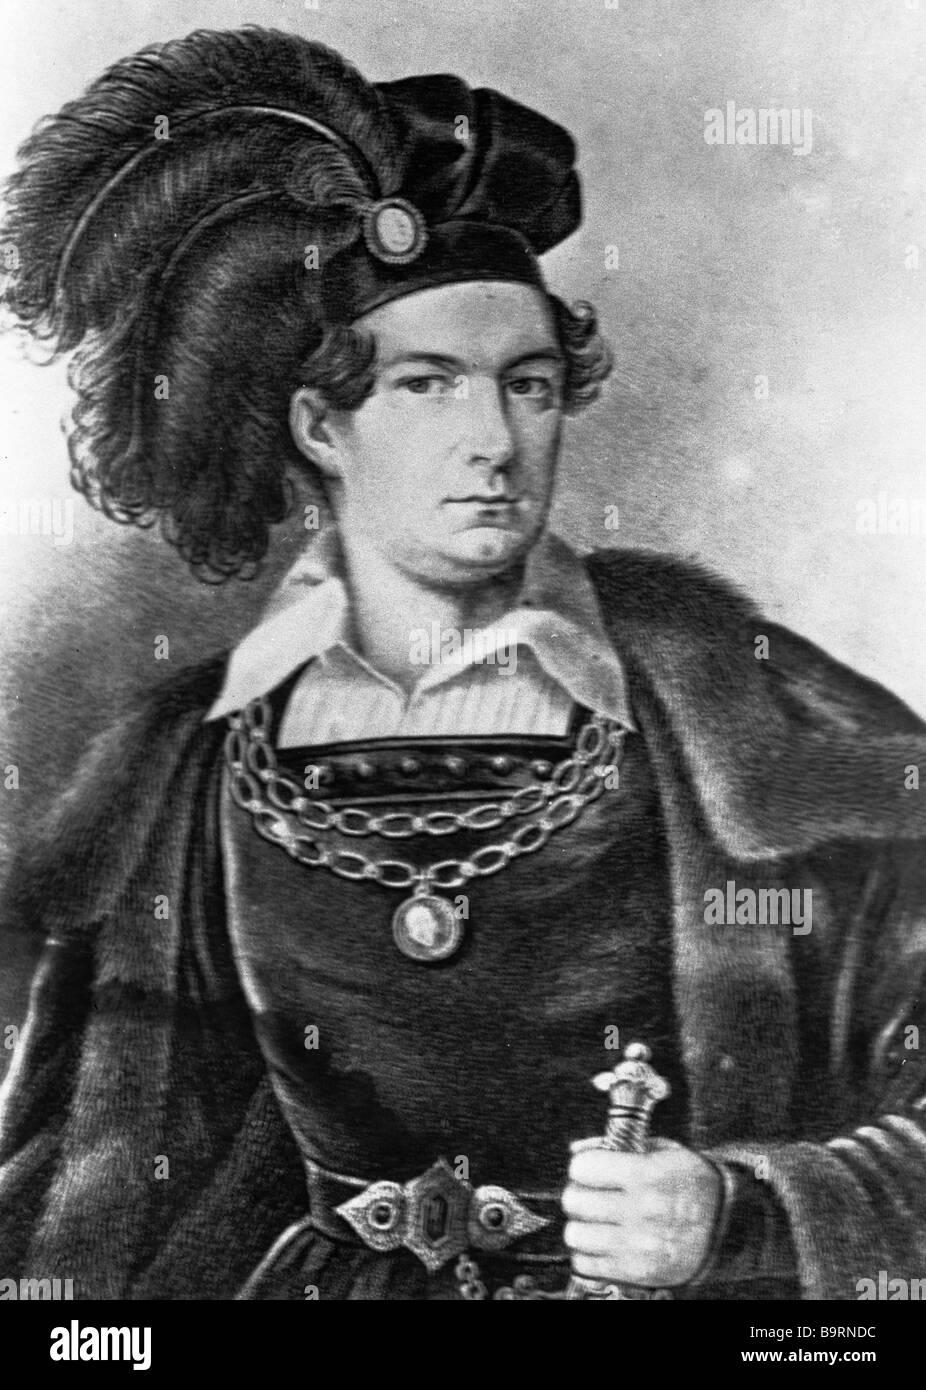 Actor Vasily Karatygin as Hamlet in the production of Hamlet staged at the Alexandrinsky Theater - Stock Image